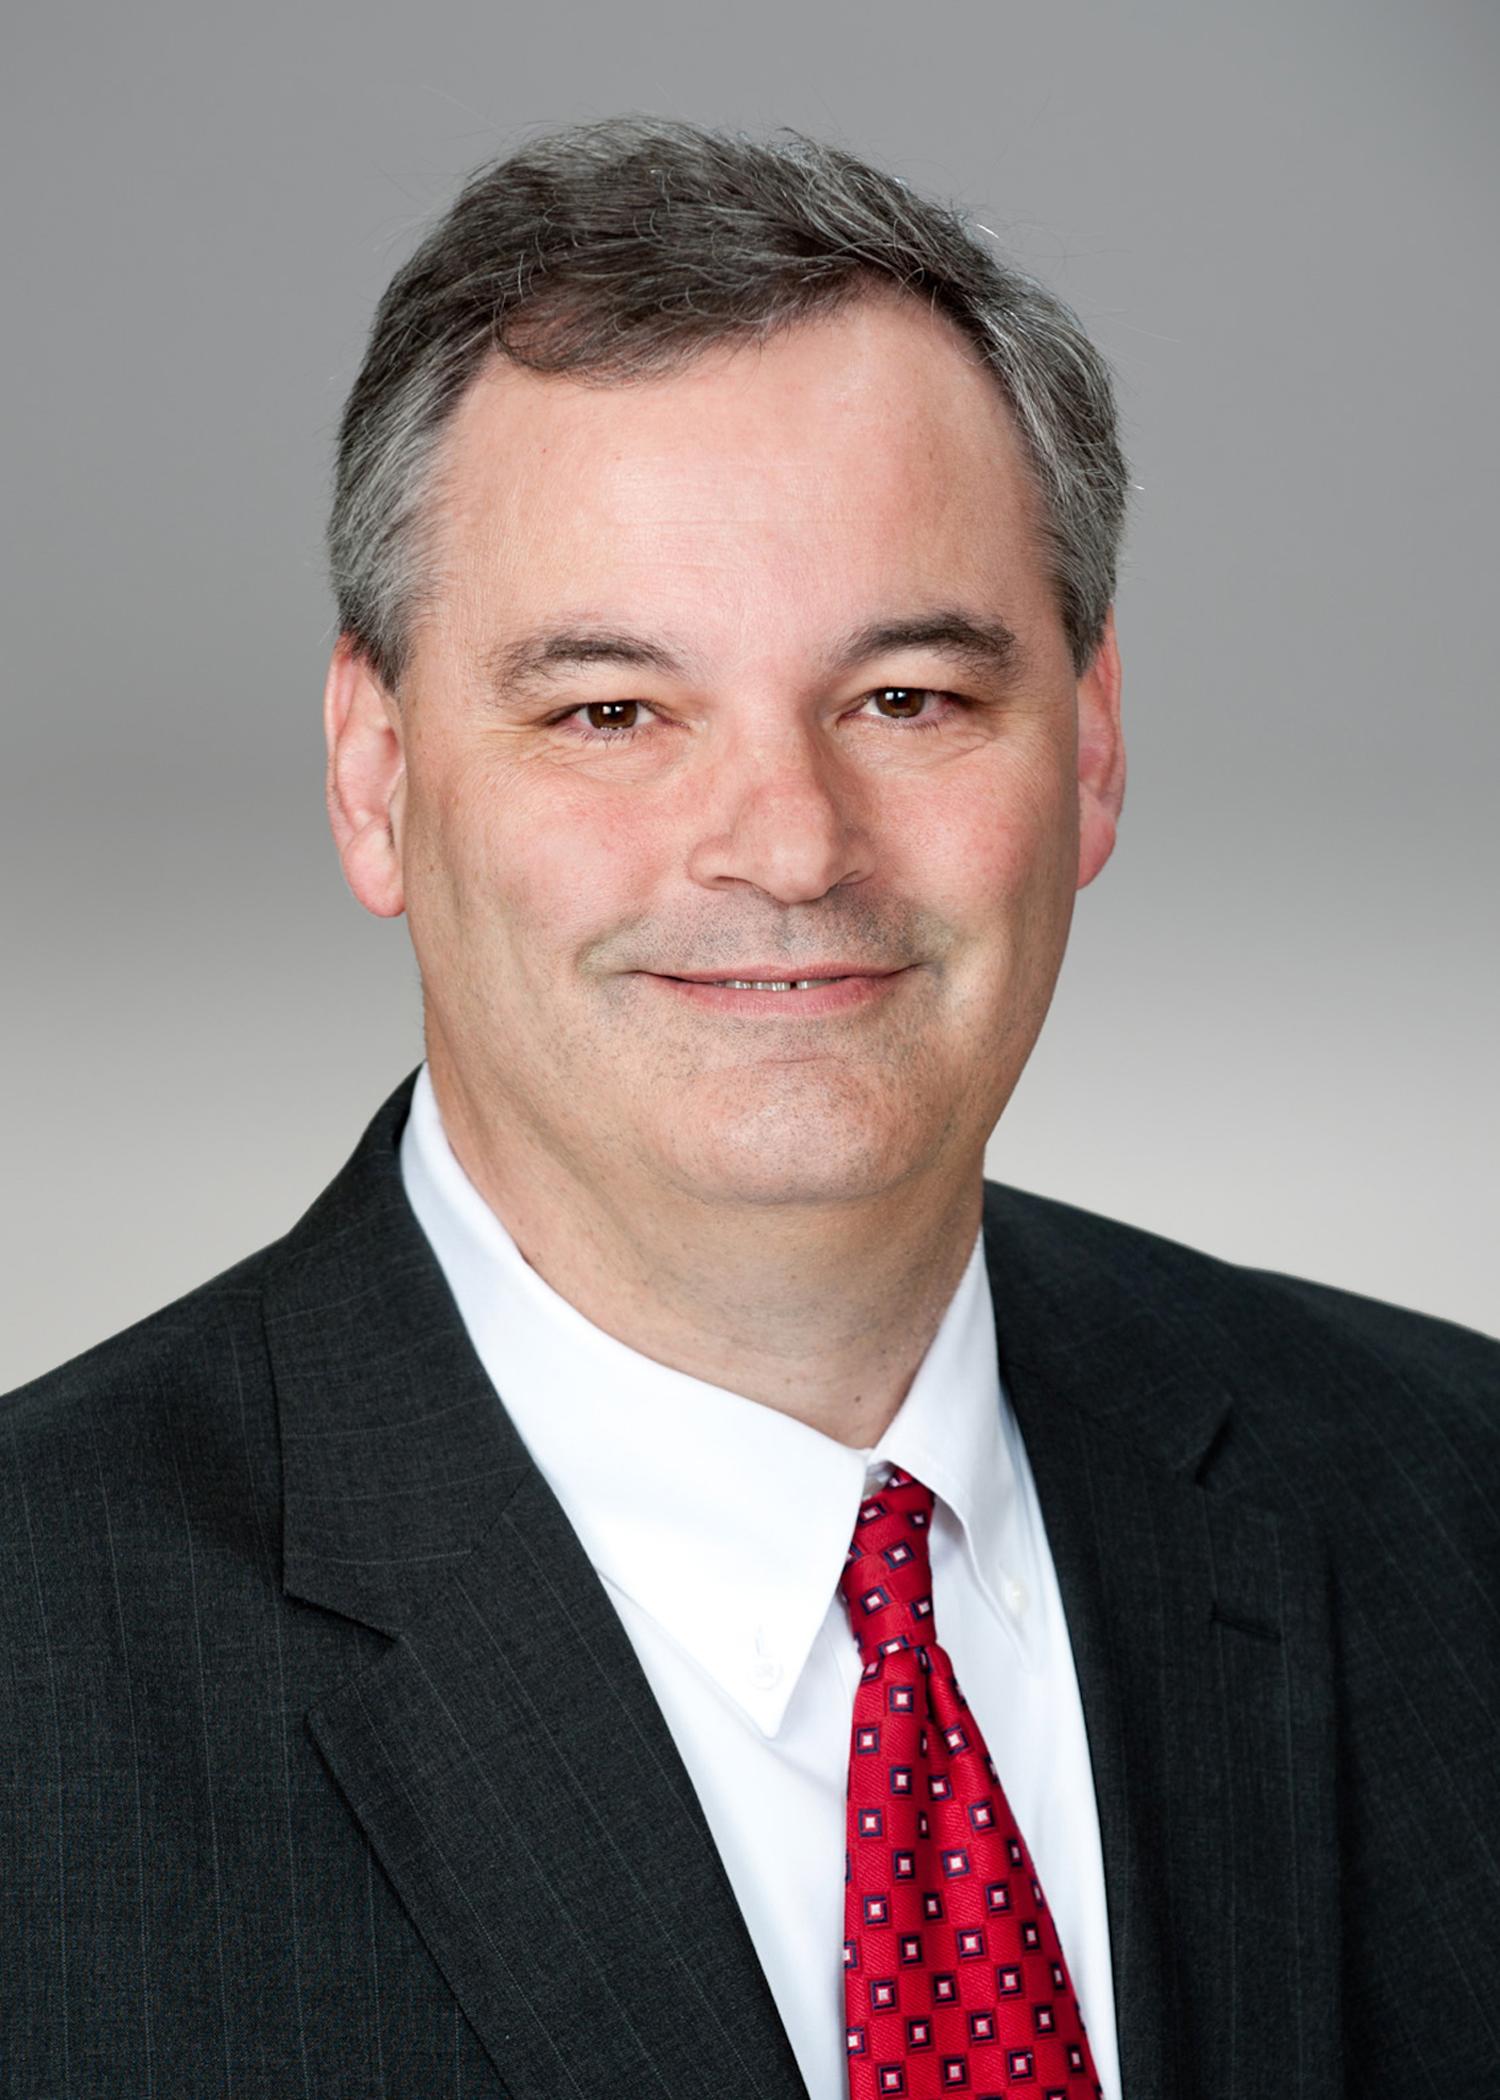 Allen Holiman, CPA in Jackson MS